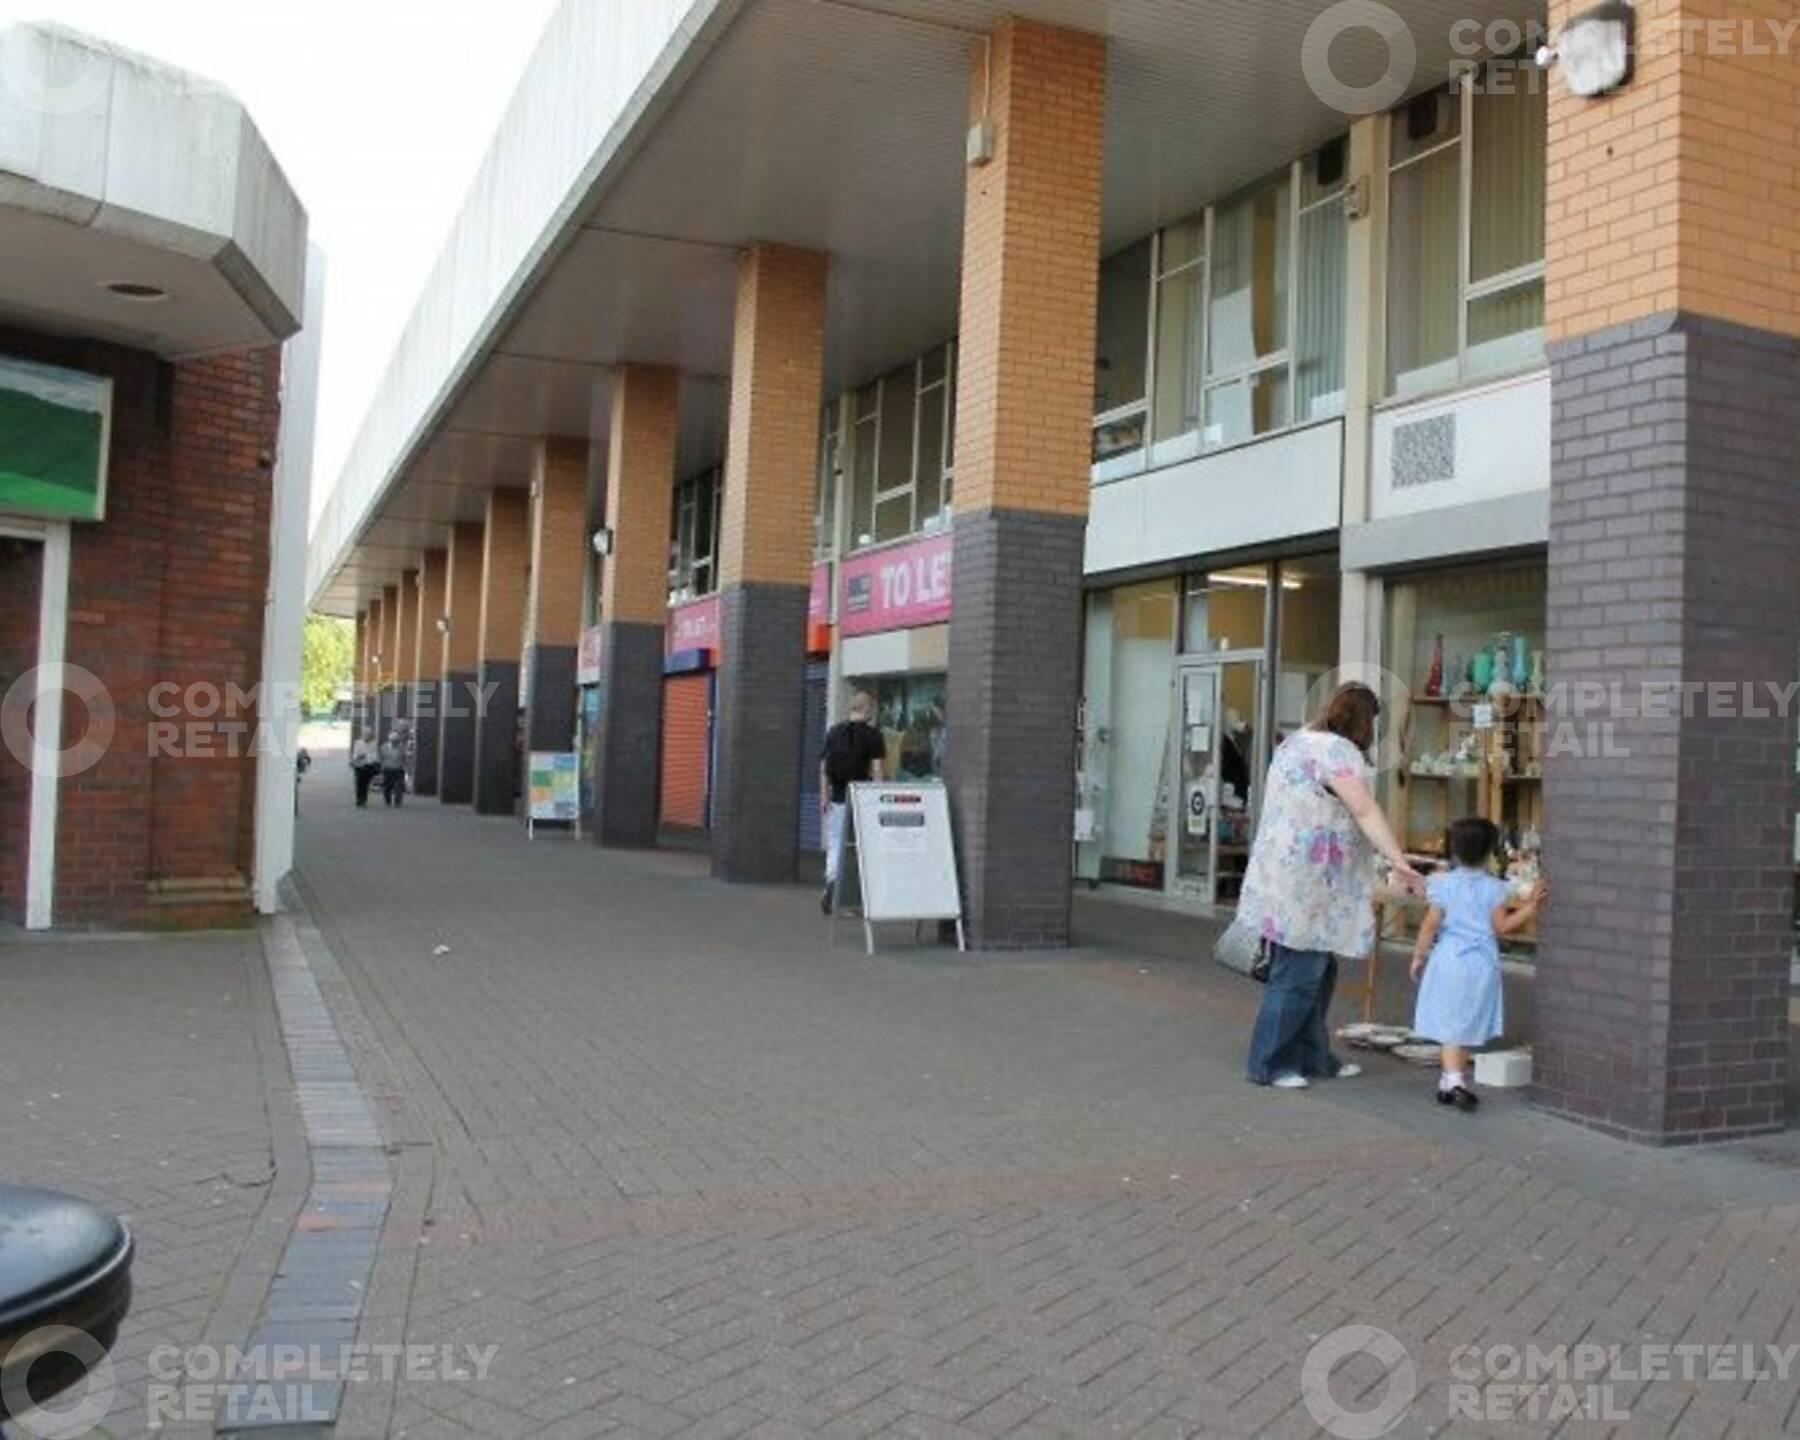 Churchill Shopping Centre